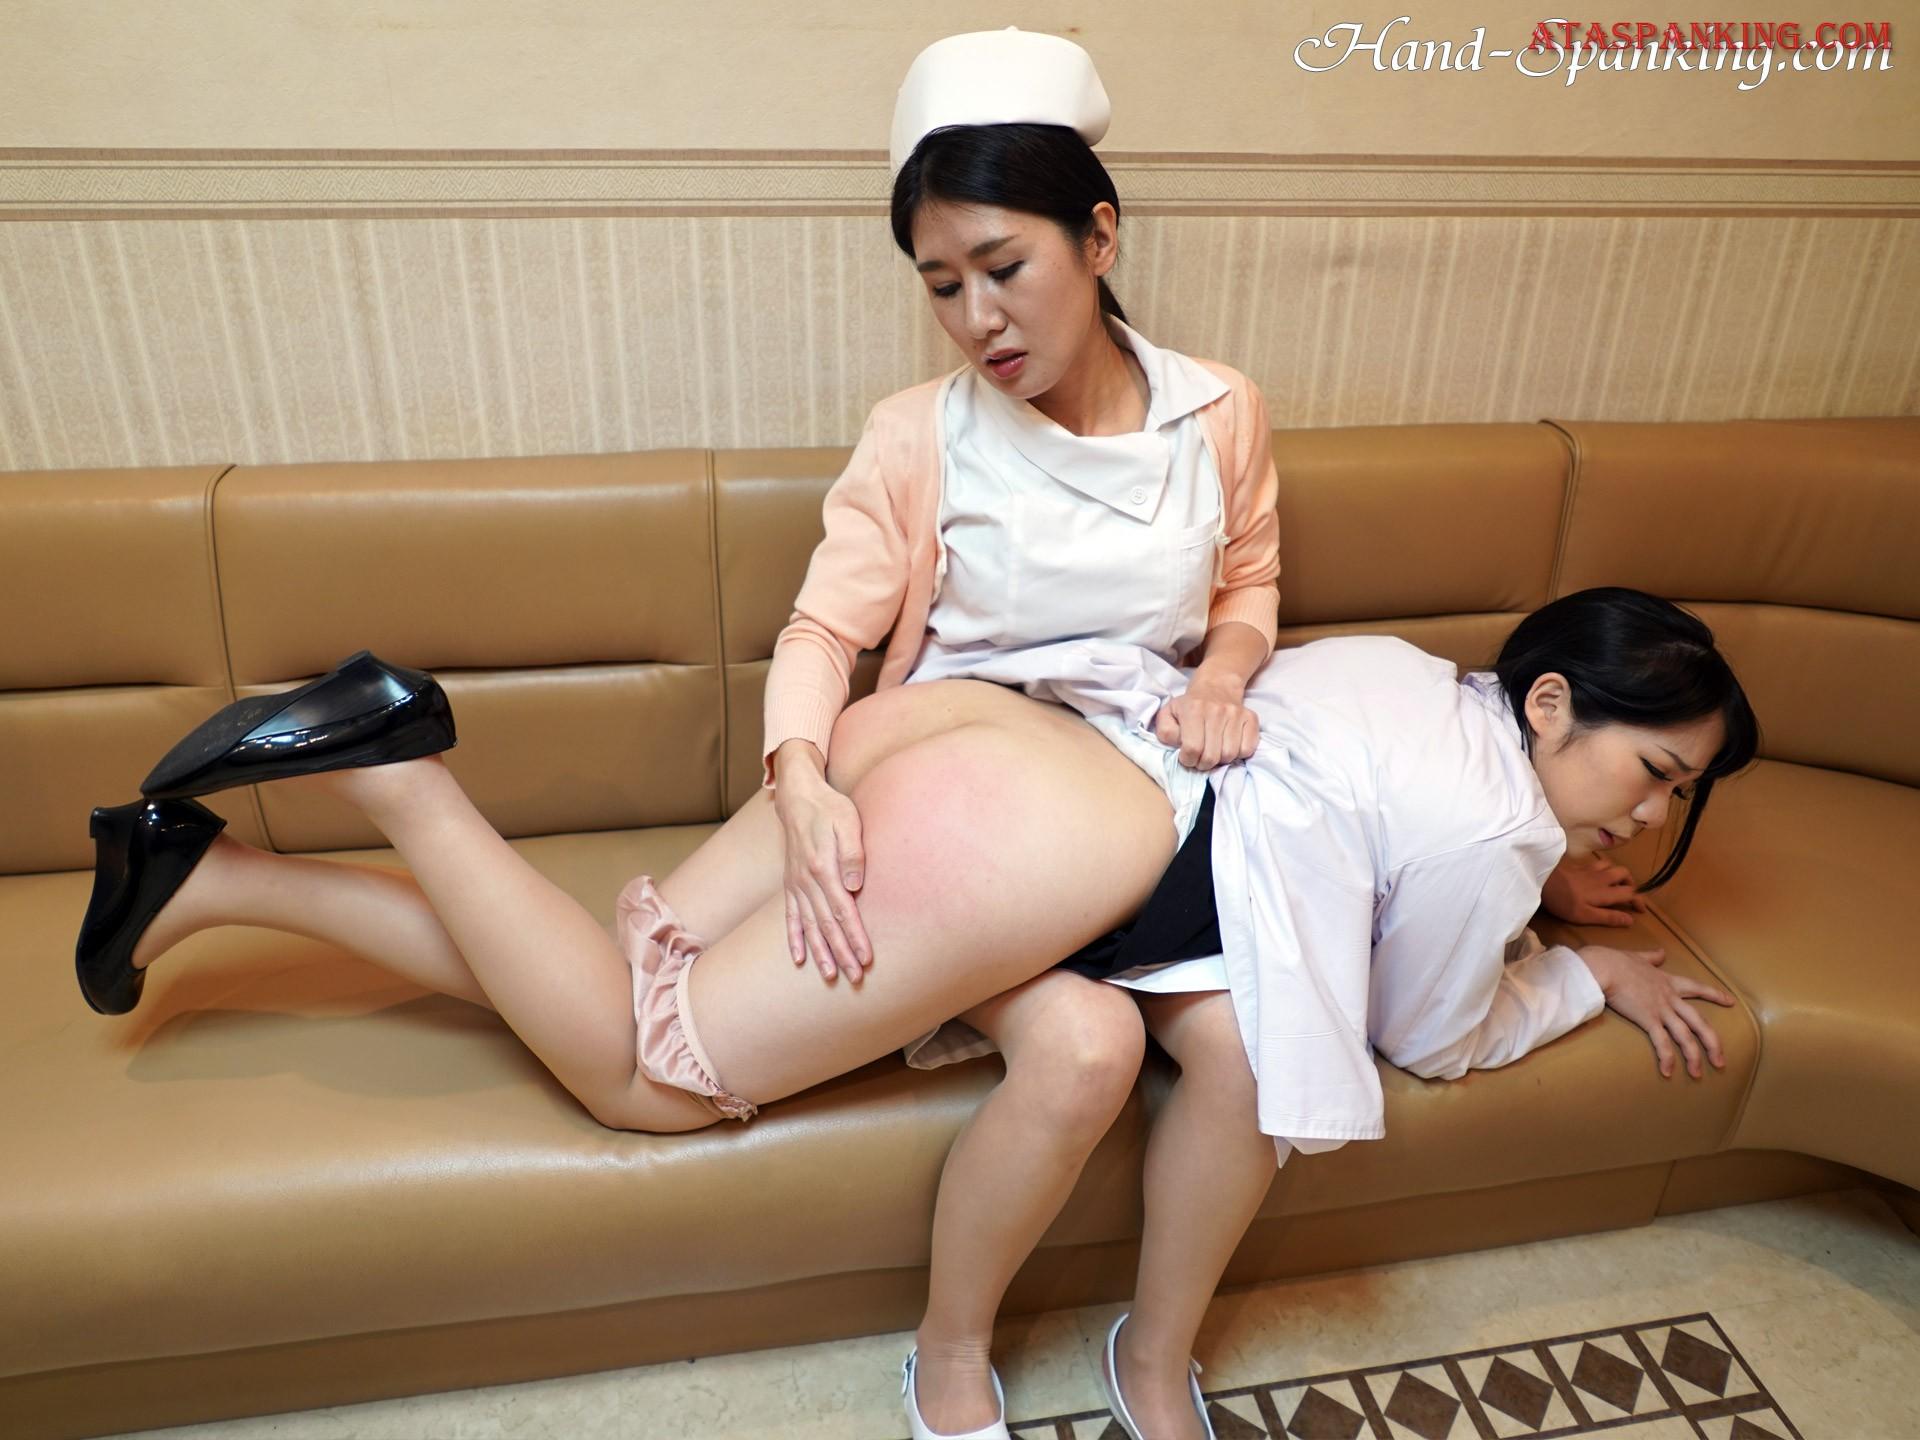 Doctor spanked